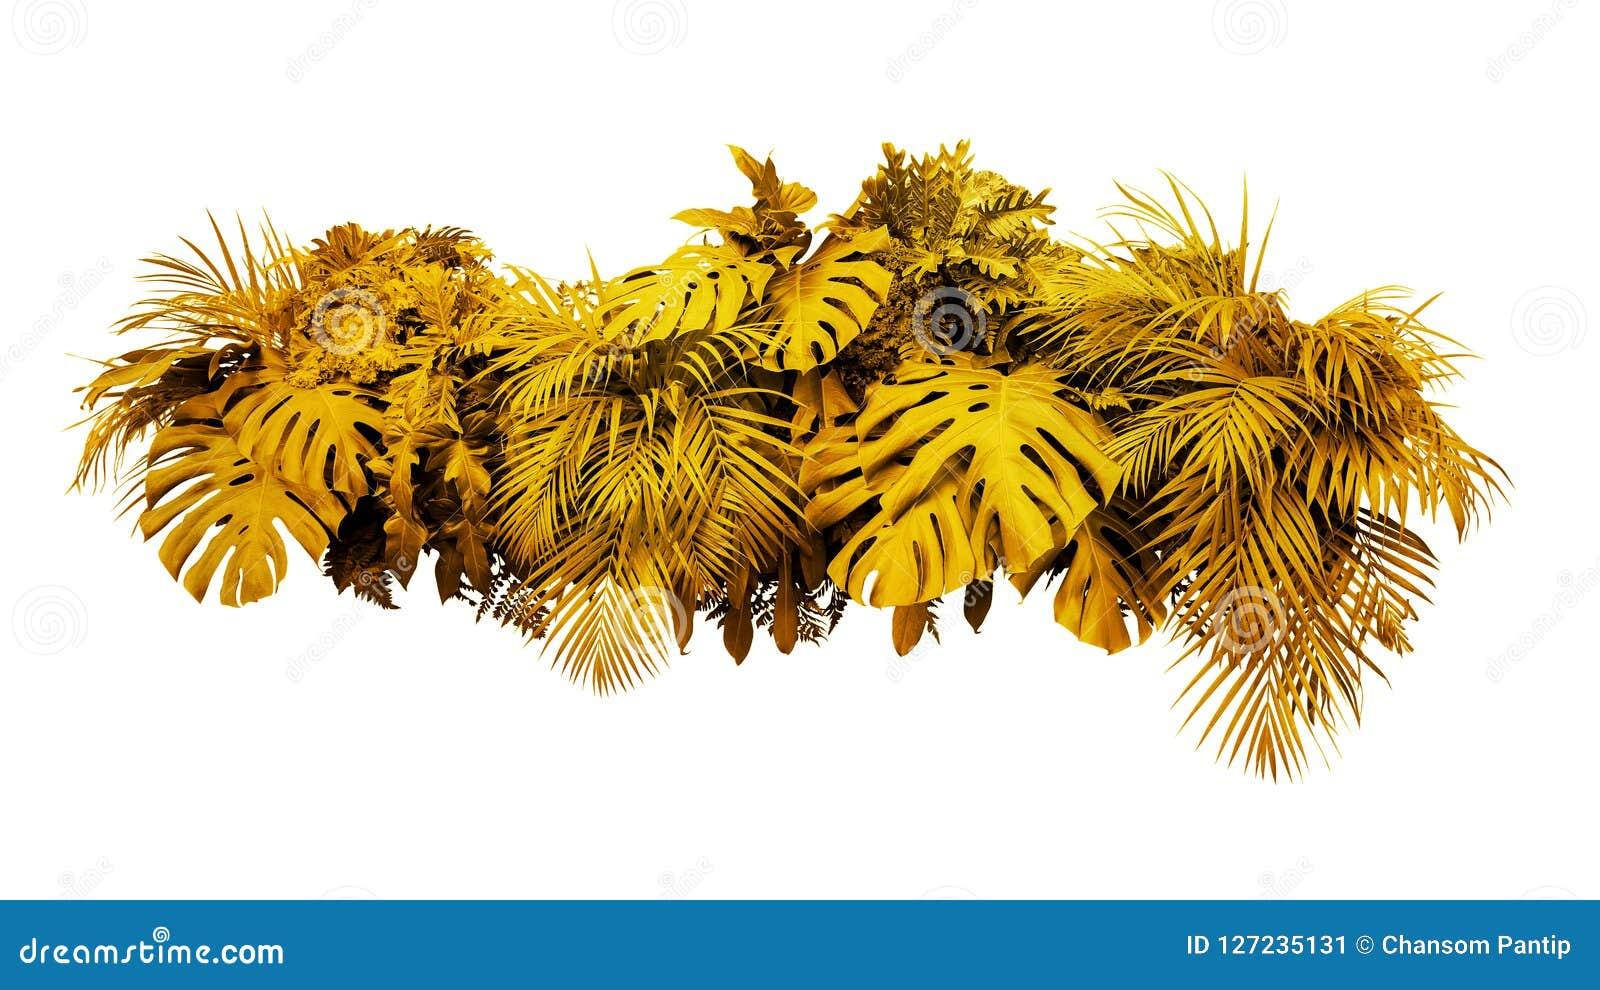 New Years Foliage >> Golden Leaves Tropical Foliage Plant Bush Floral Arrangement Gold